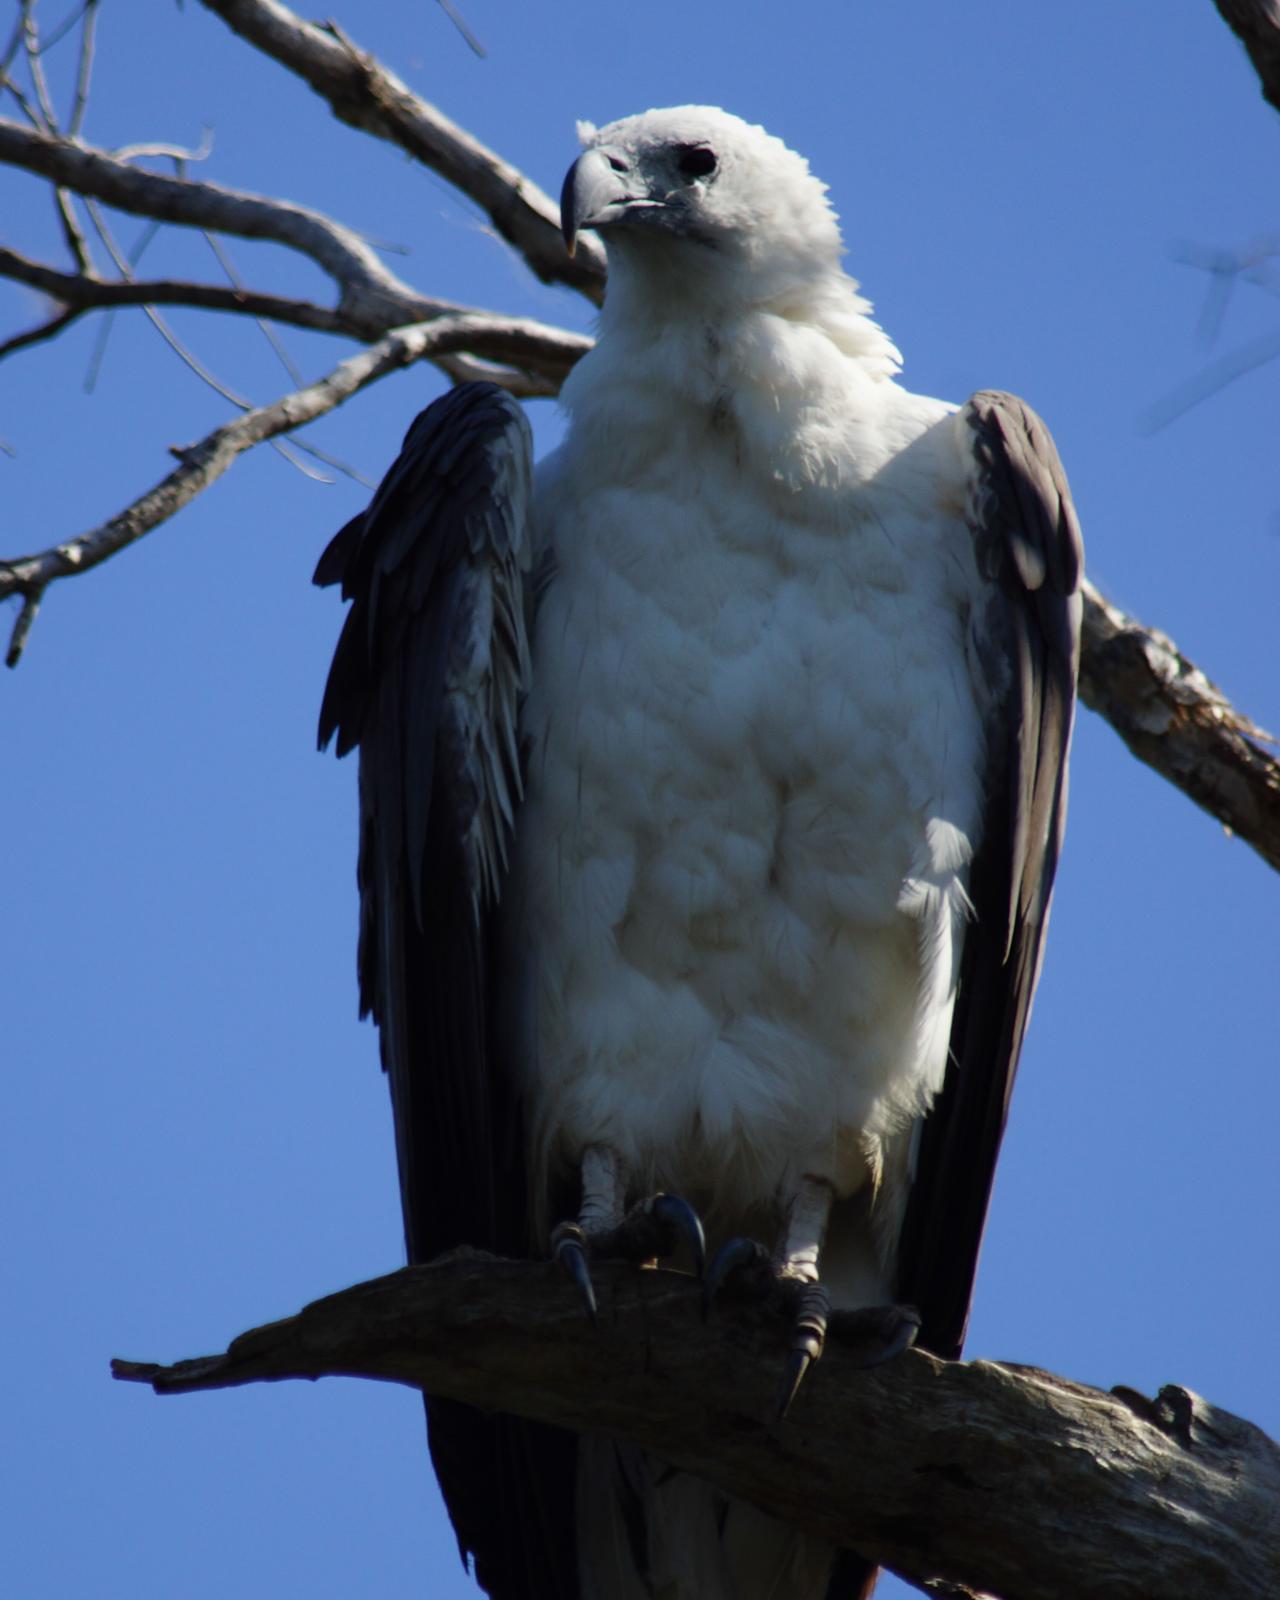 White-bellied Sea-Eagle Photo by Steve Percival